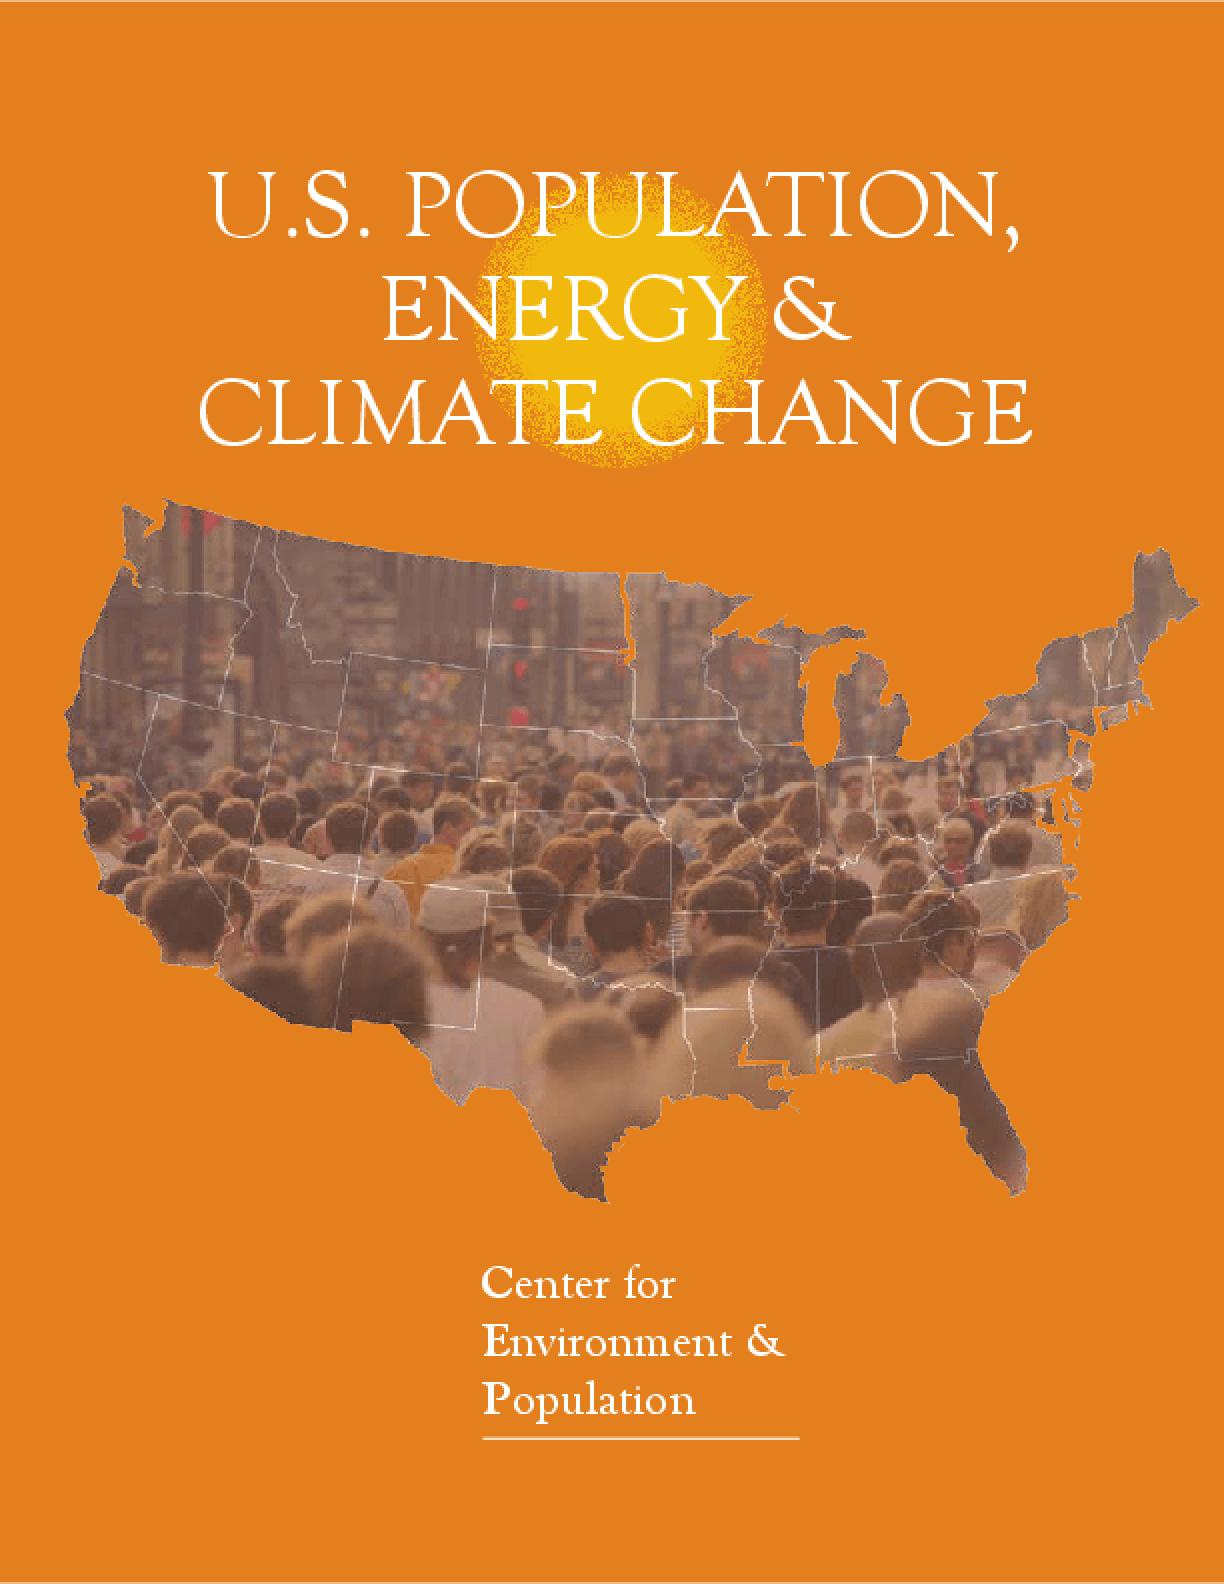 U.S. Population, Energy & Climate Change